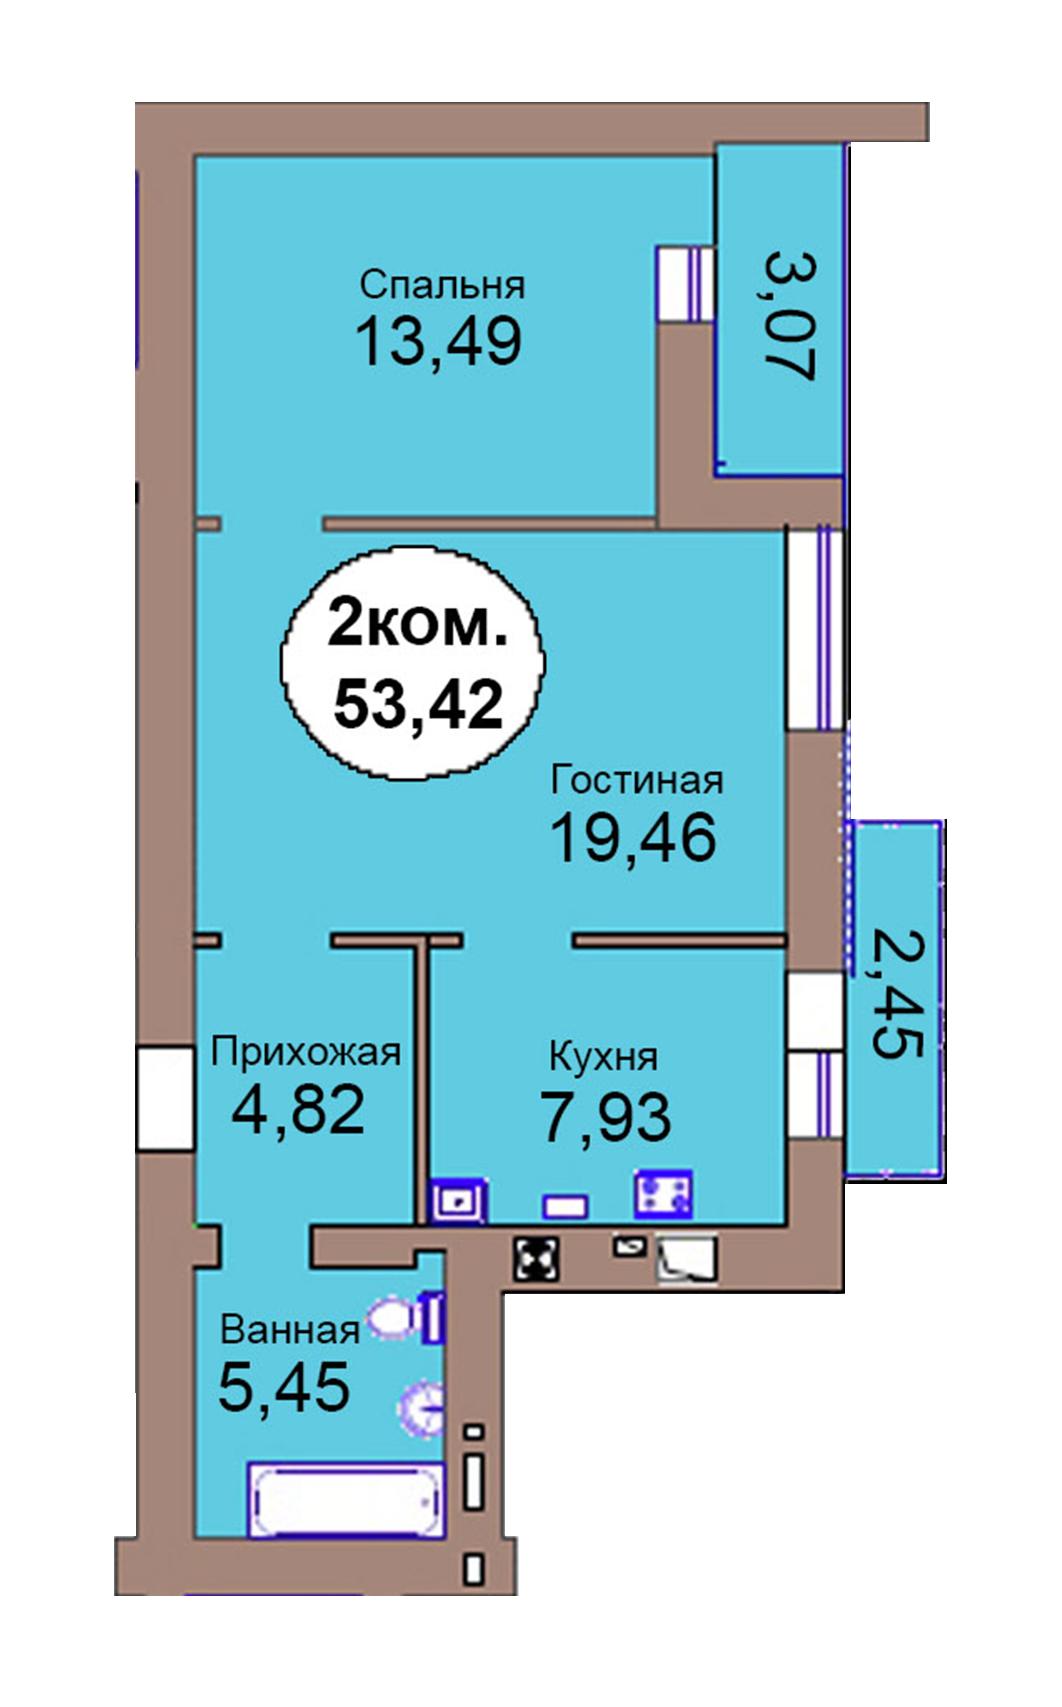 2-комн. кв. по пер. Калининградский, 4  кв. 78 в Калининграде